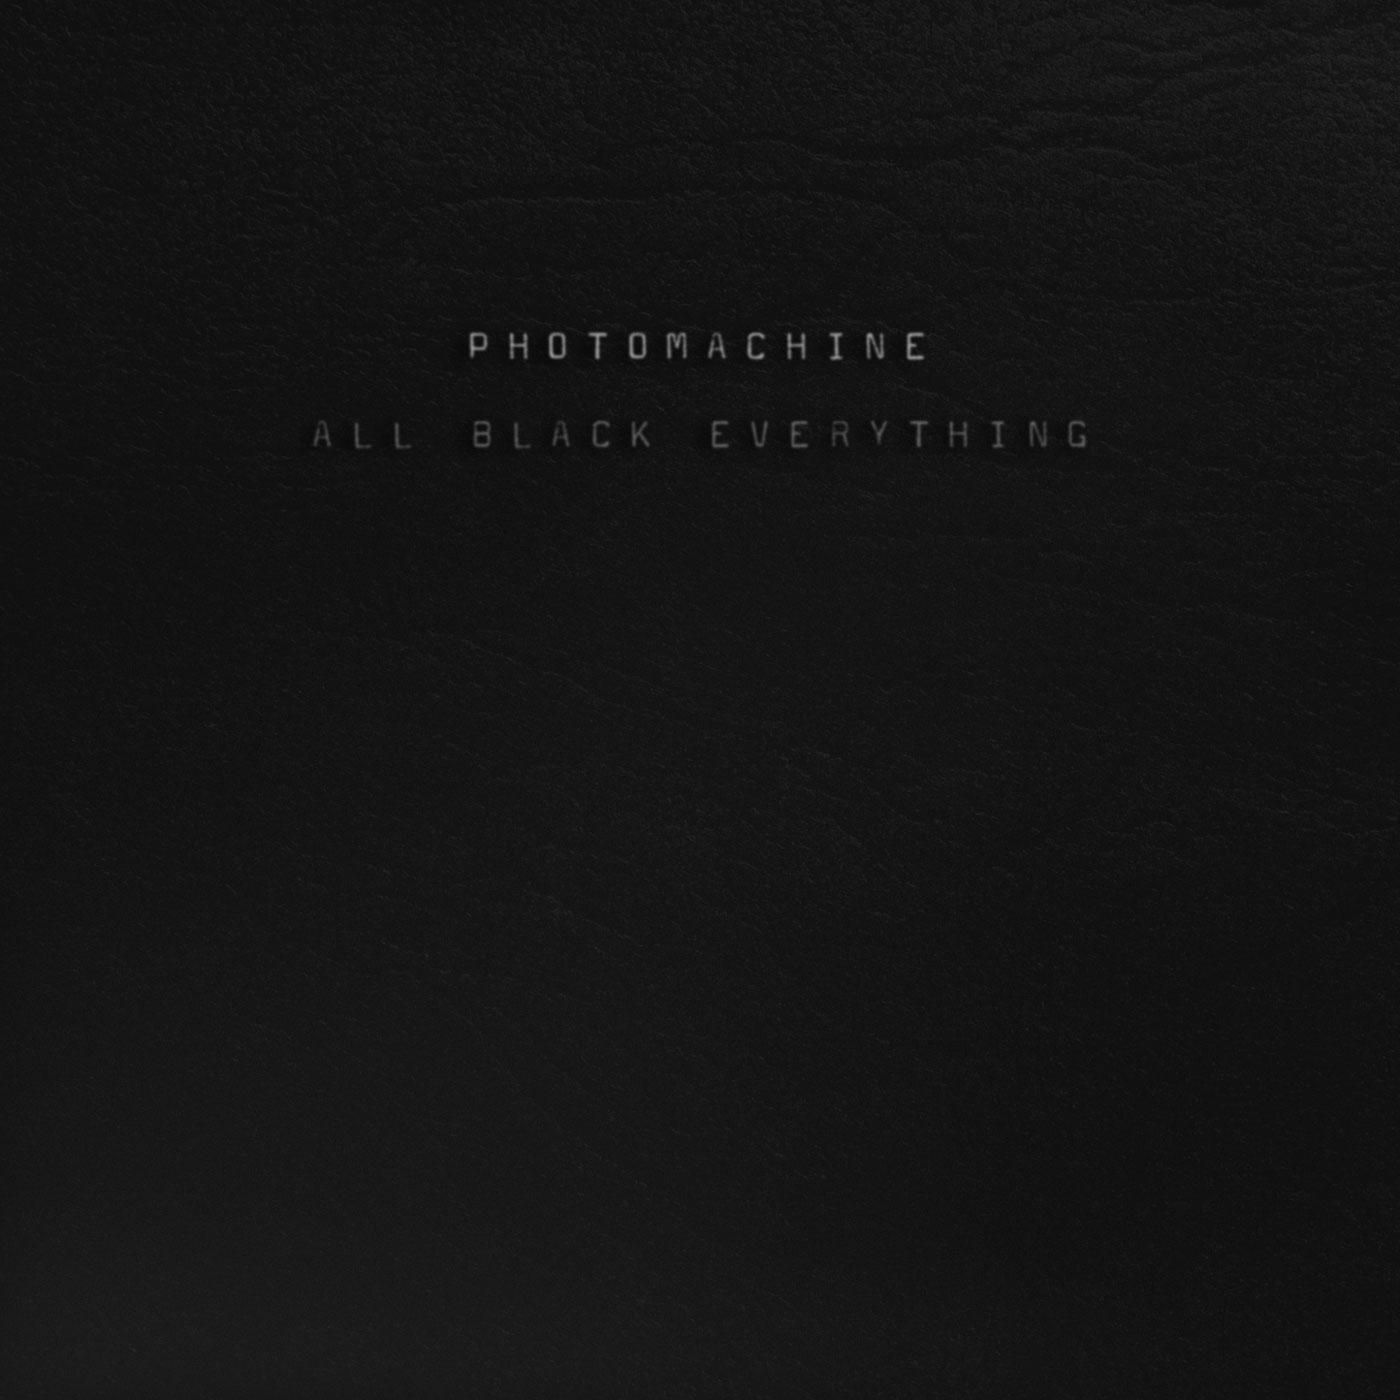 "PhOtOmachine/ALL BLACK EVERYTHING EP 12"""